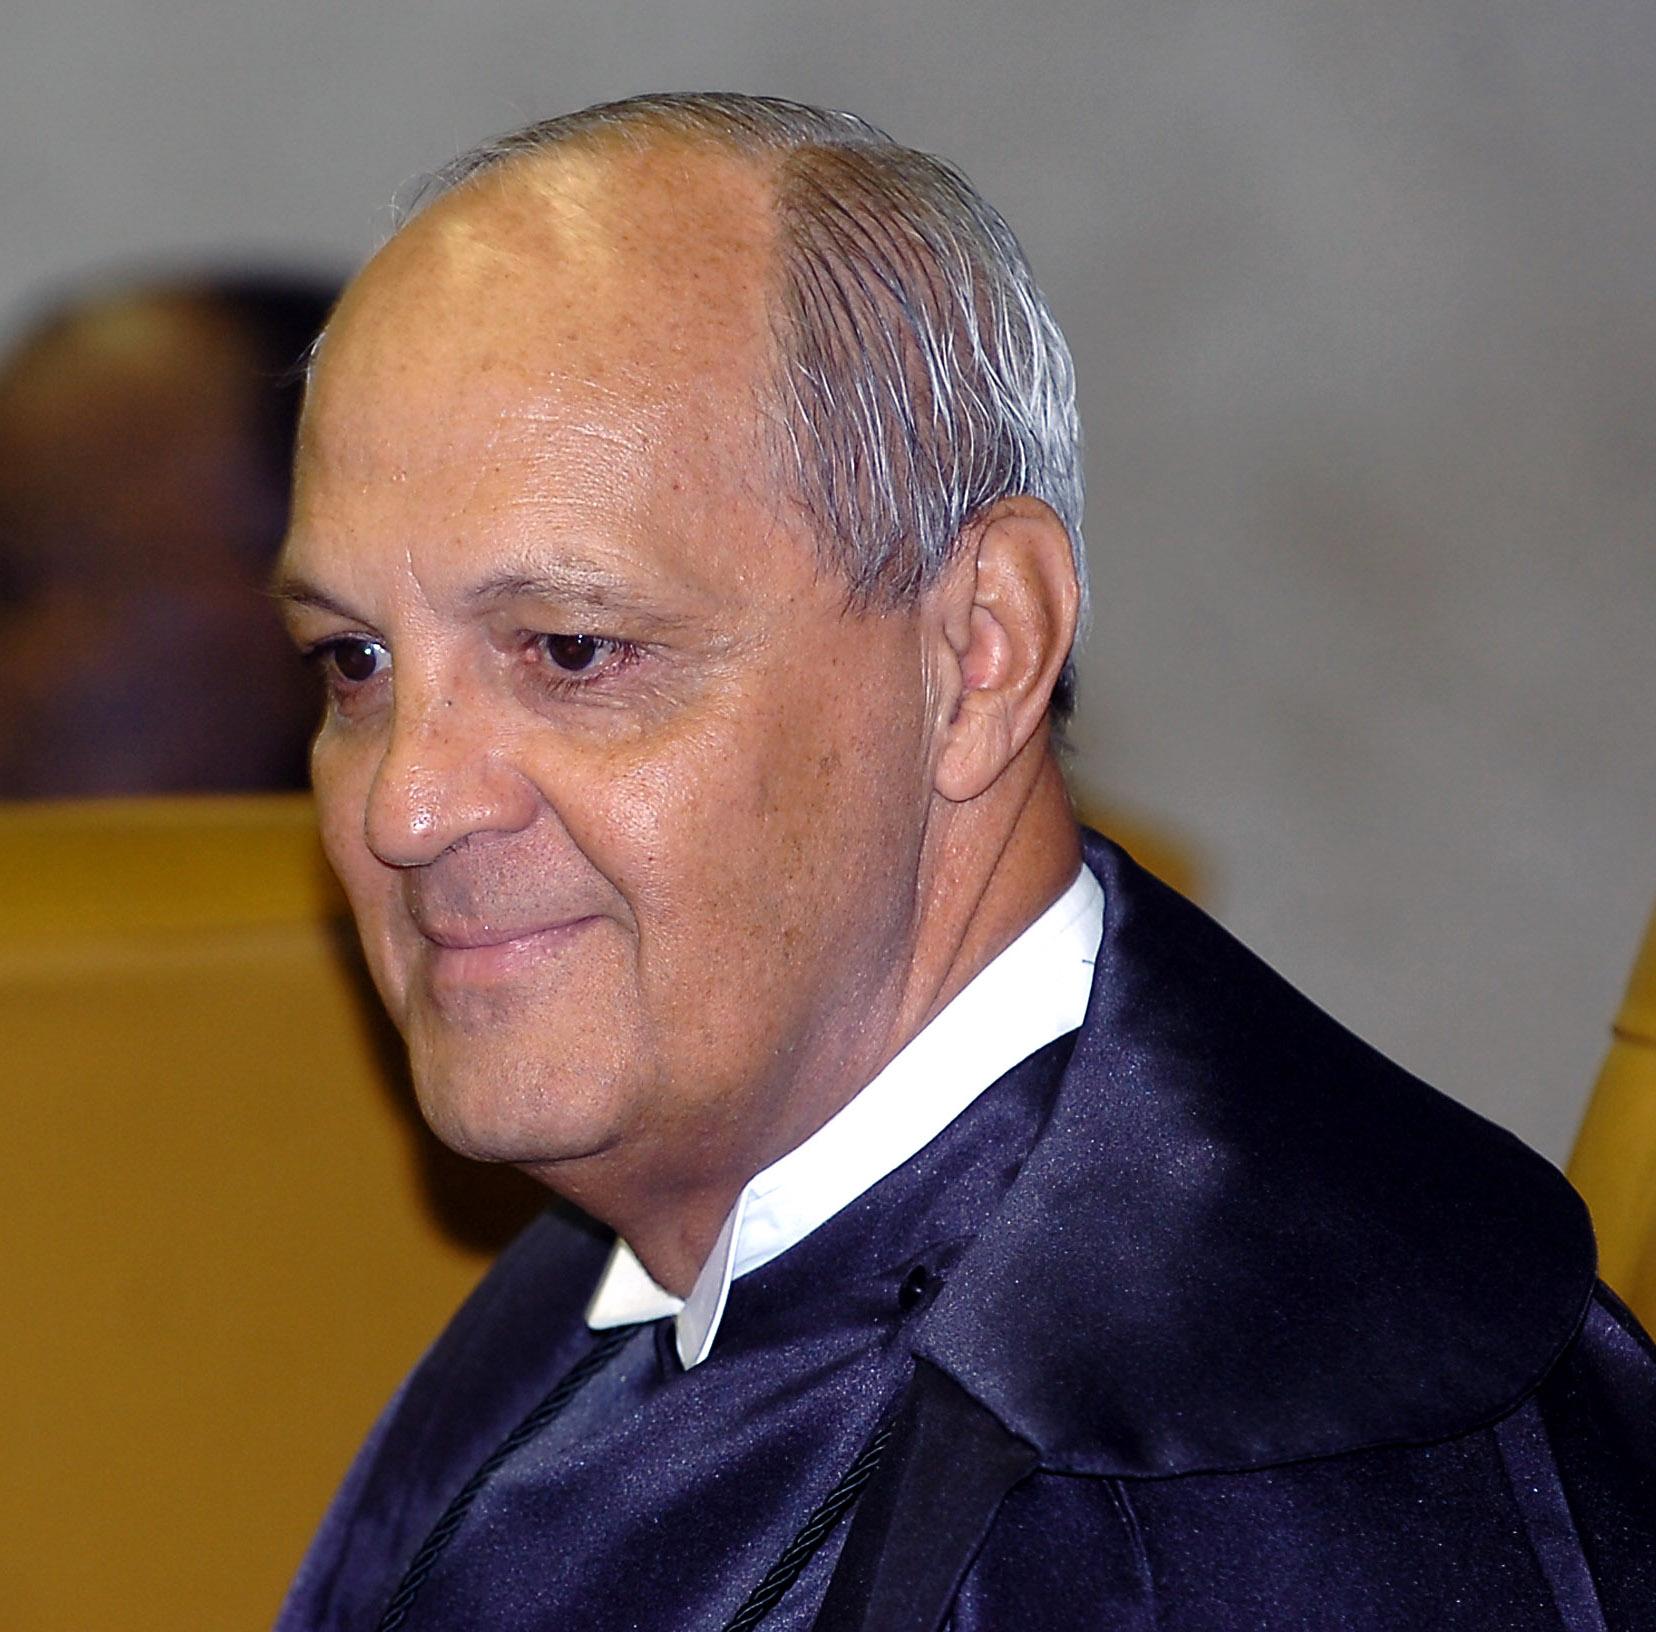 Justice Carlos Alberto Menezes Direito in 2007